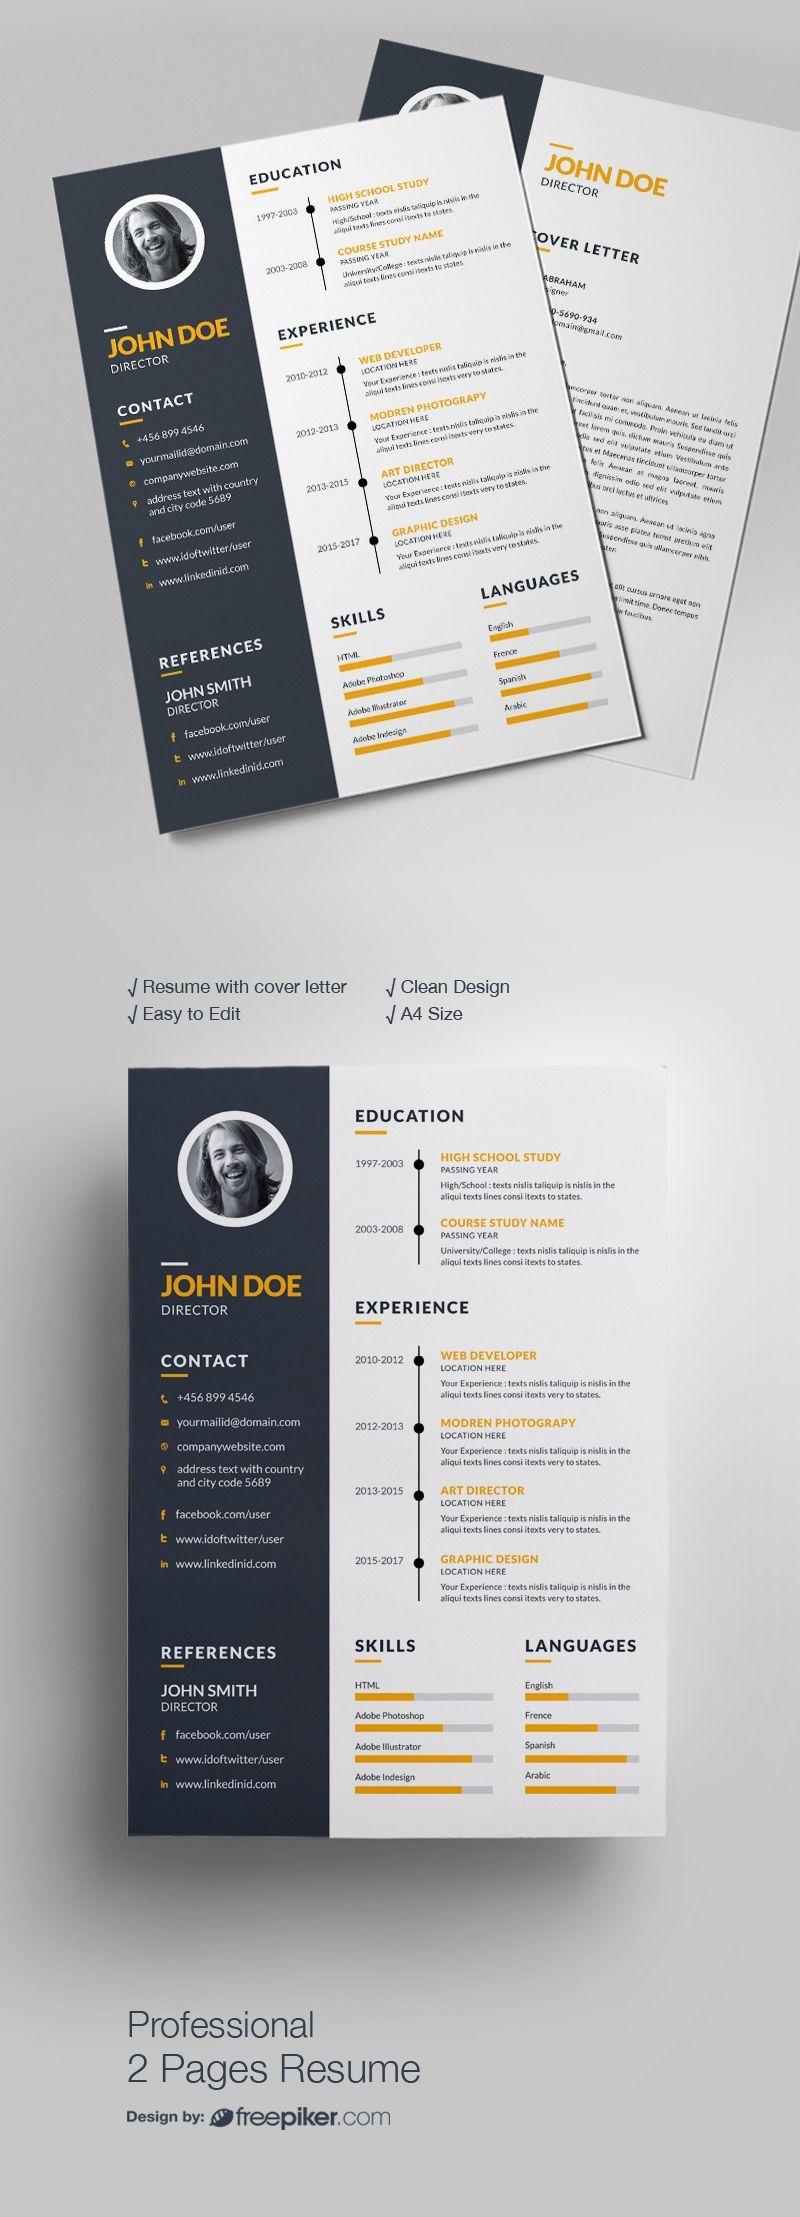 Simple Resume Design | Resumes | Pinterest | Simple resume, Logo psd ...